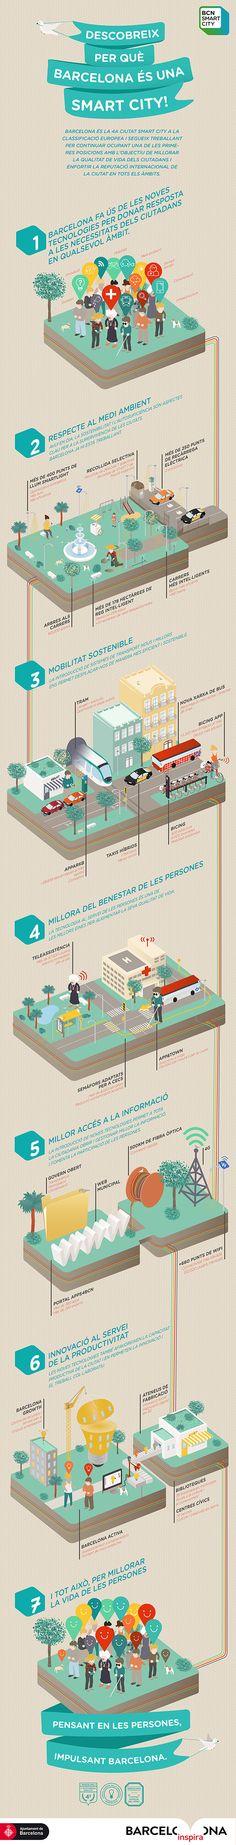 Infographic, Barcelona Smart City on Behance